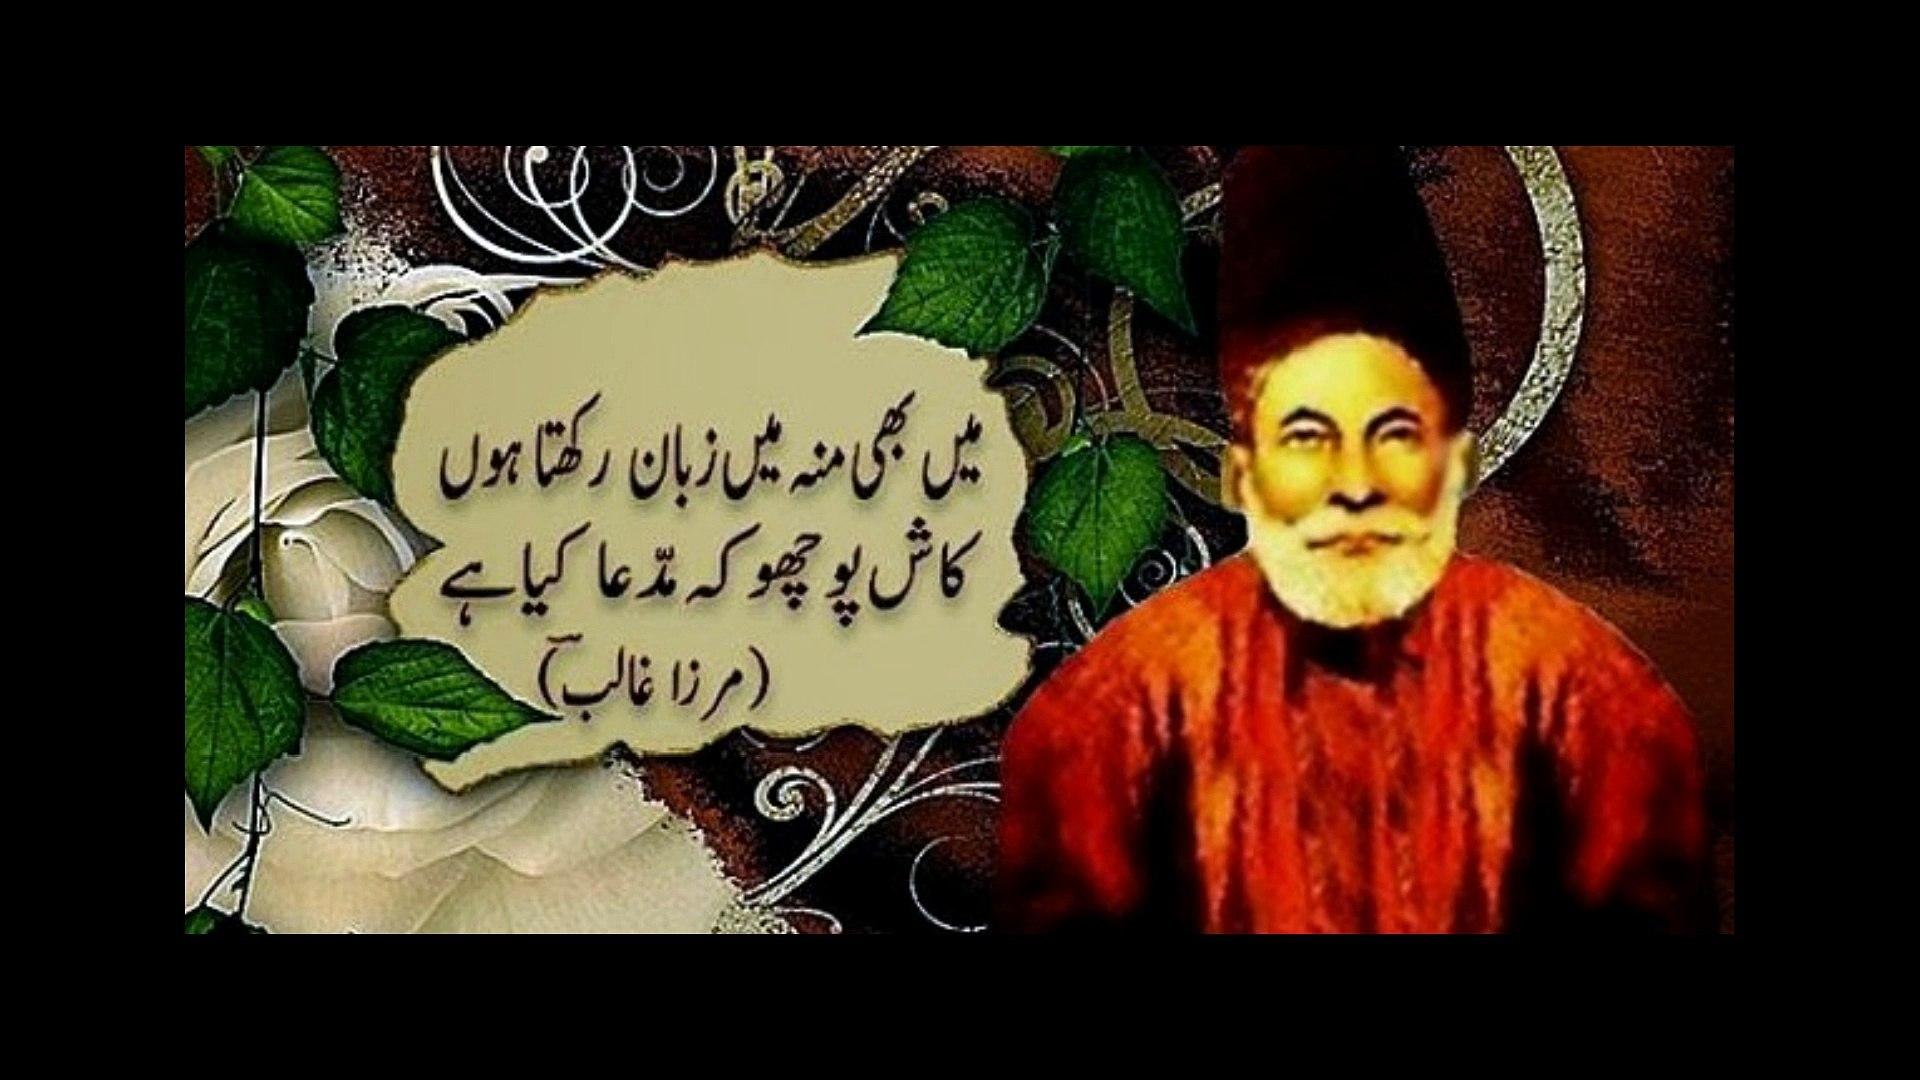 Urdu Poetry Urdu Shayari Love Romantic Sad Mirza Ghalib